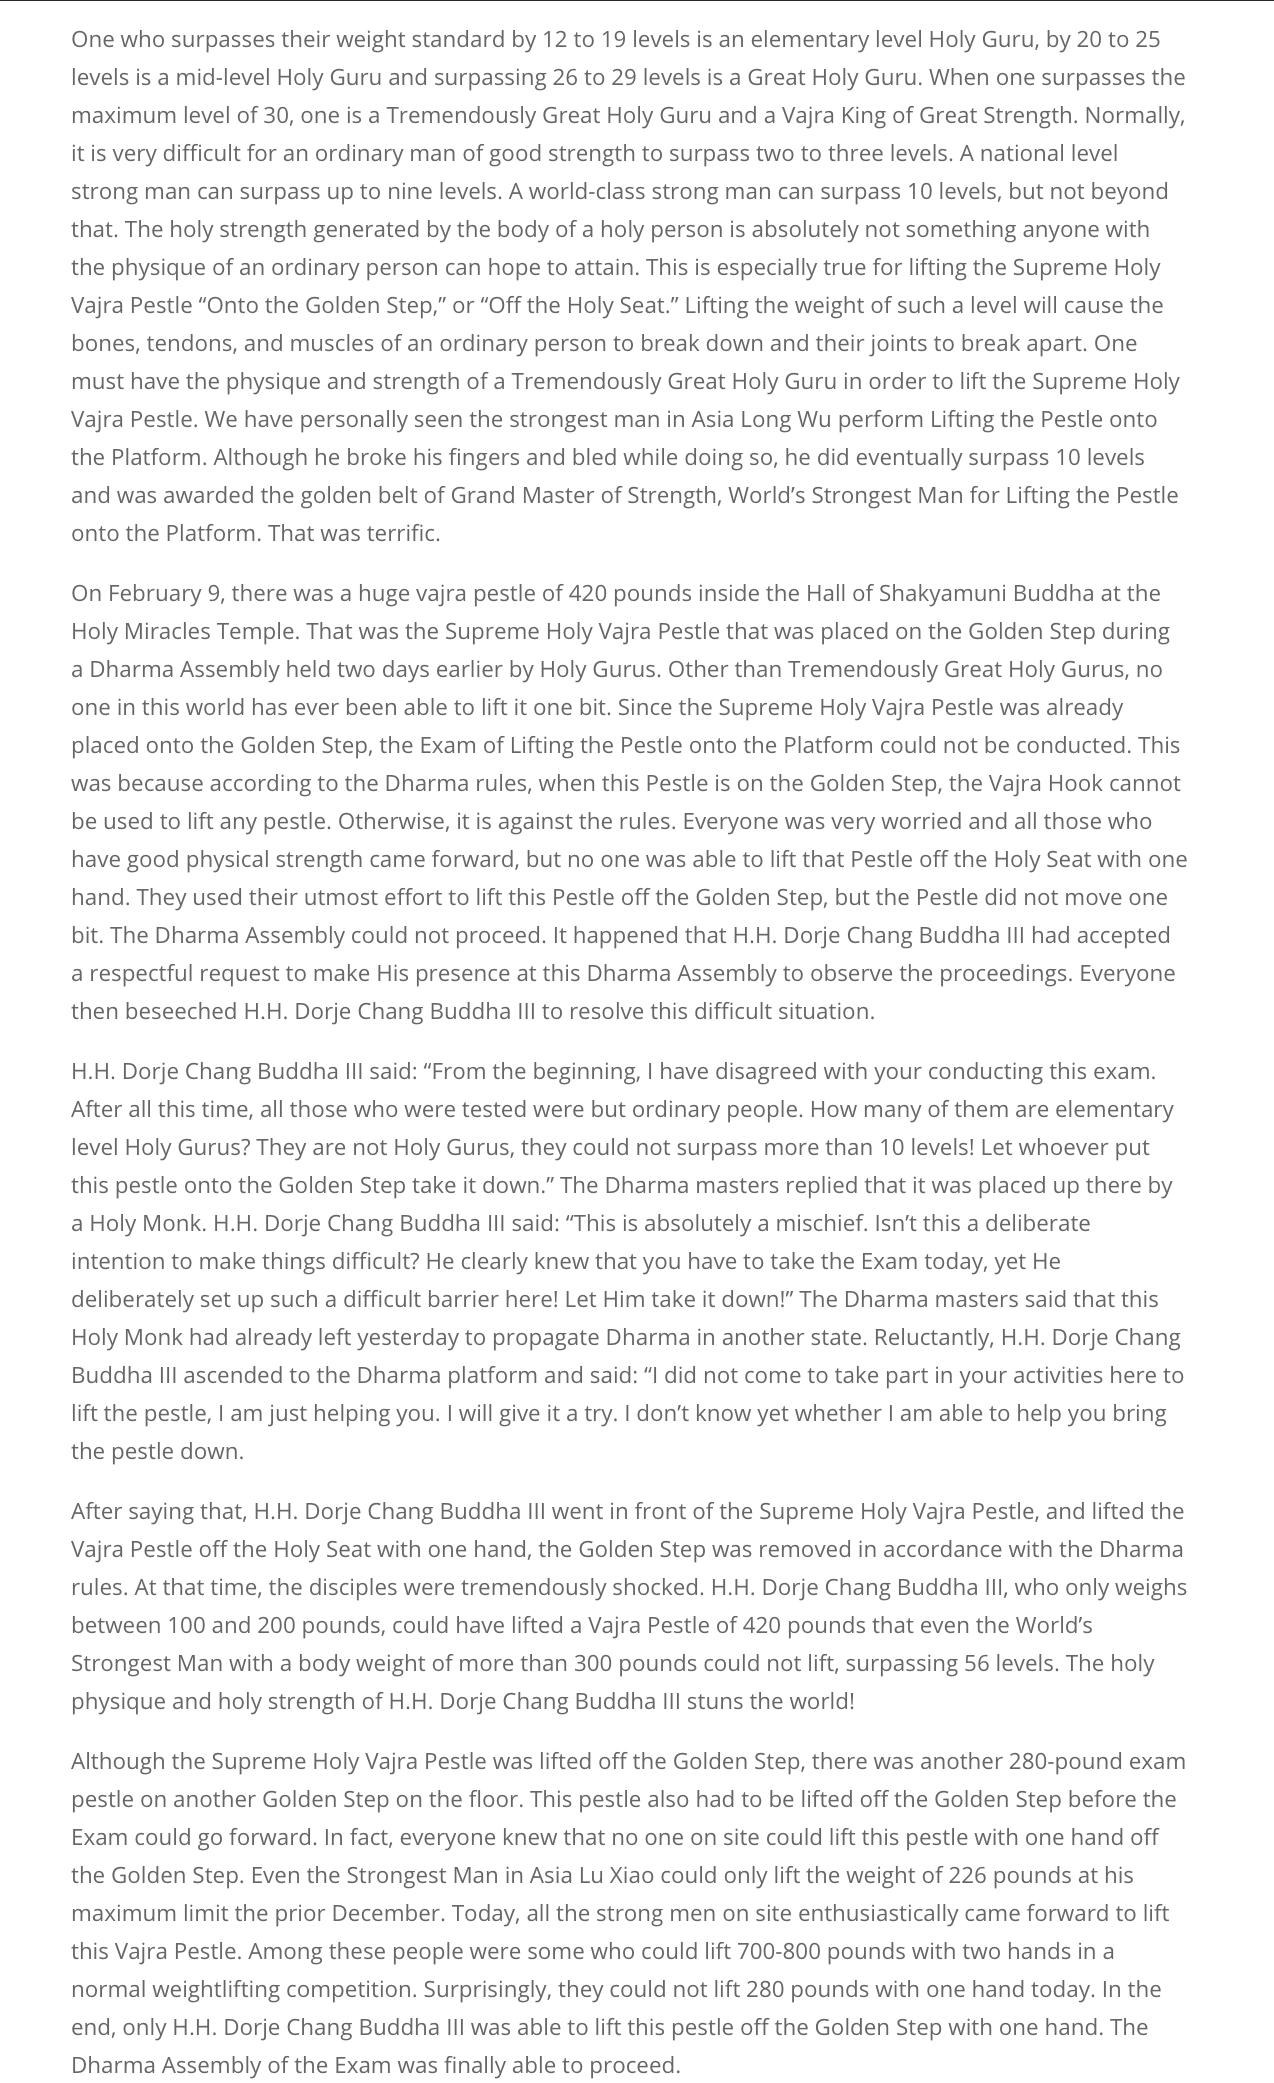 USA Today_True Buddha Dharma Factually Manifests Realization Power 2X